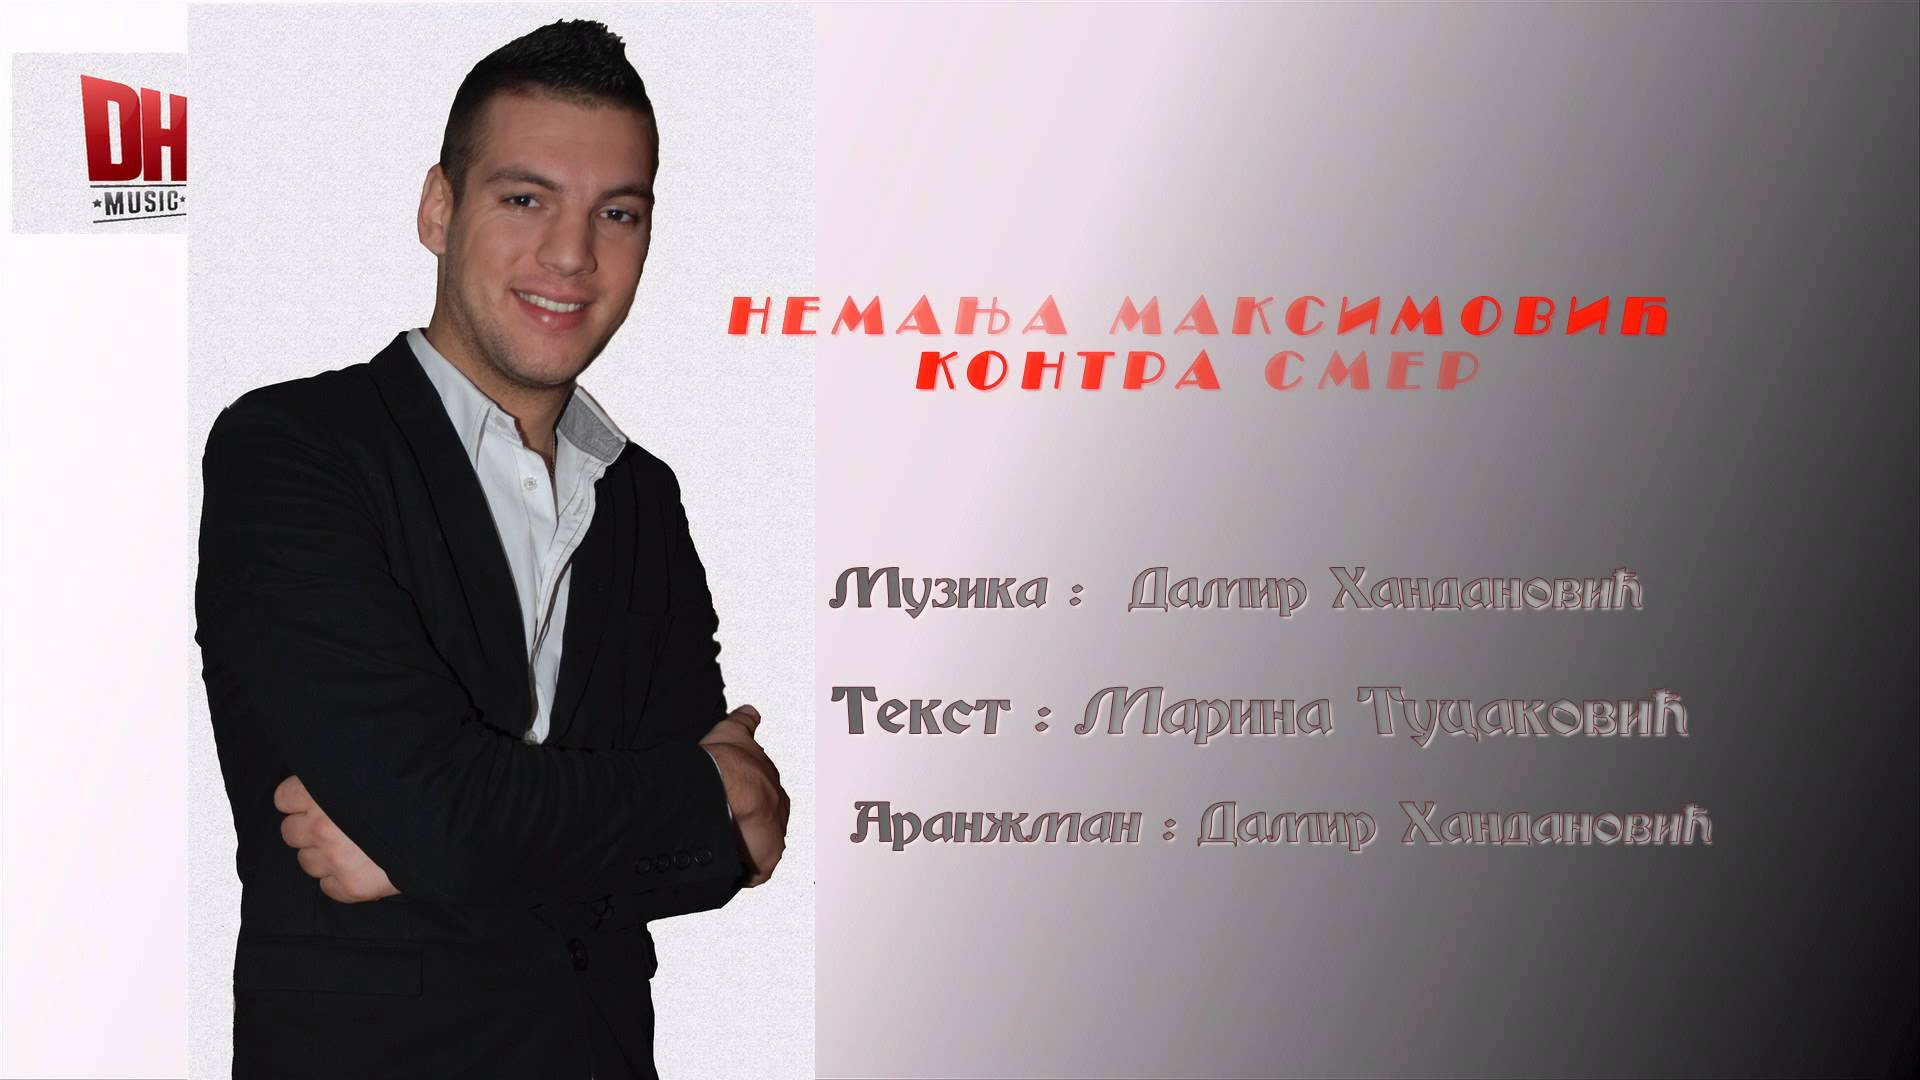 Nemanja Maksimovic – 2014 – Kontra Smer (Promo)